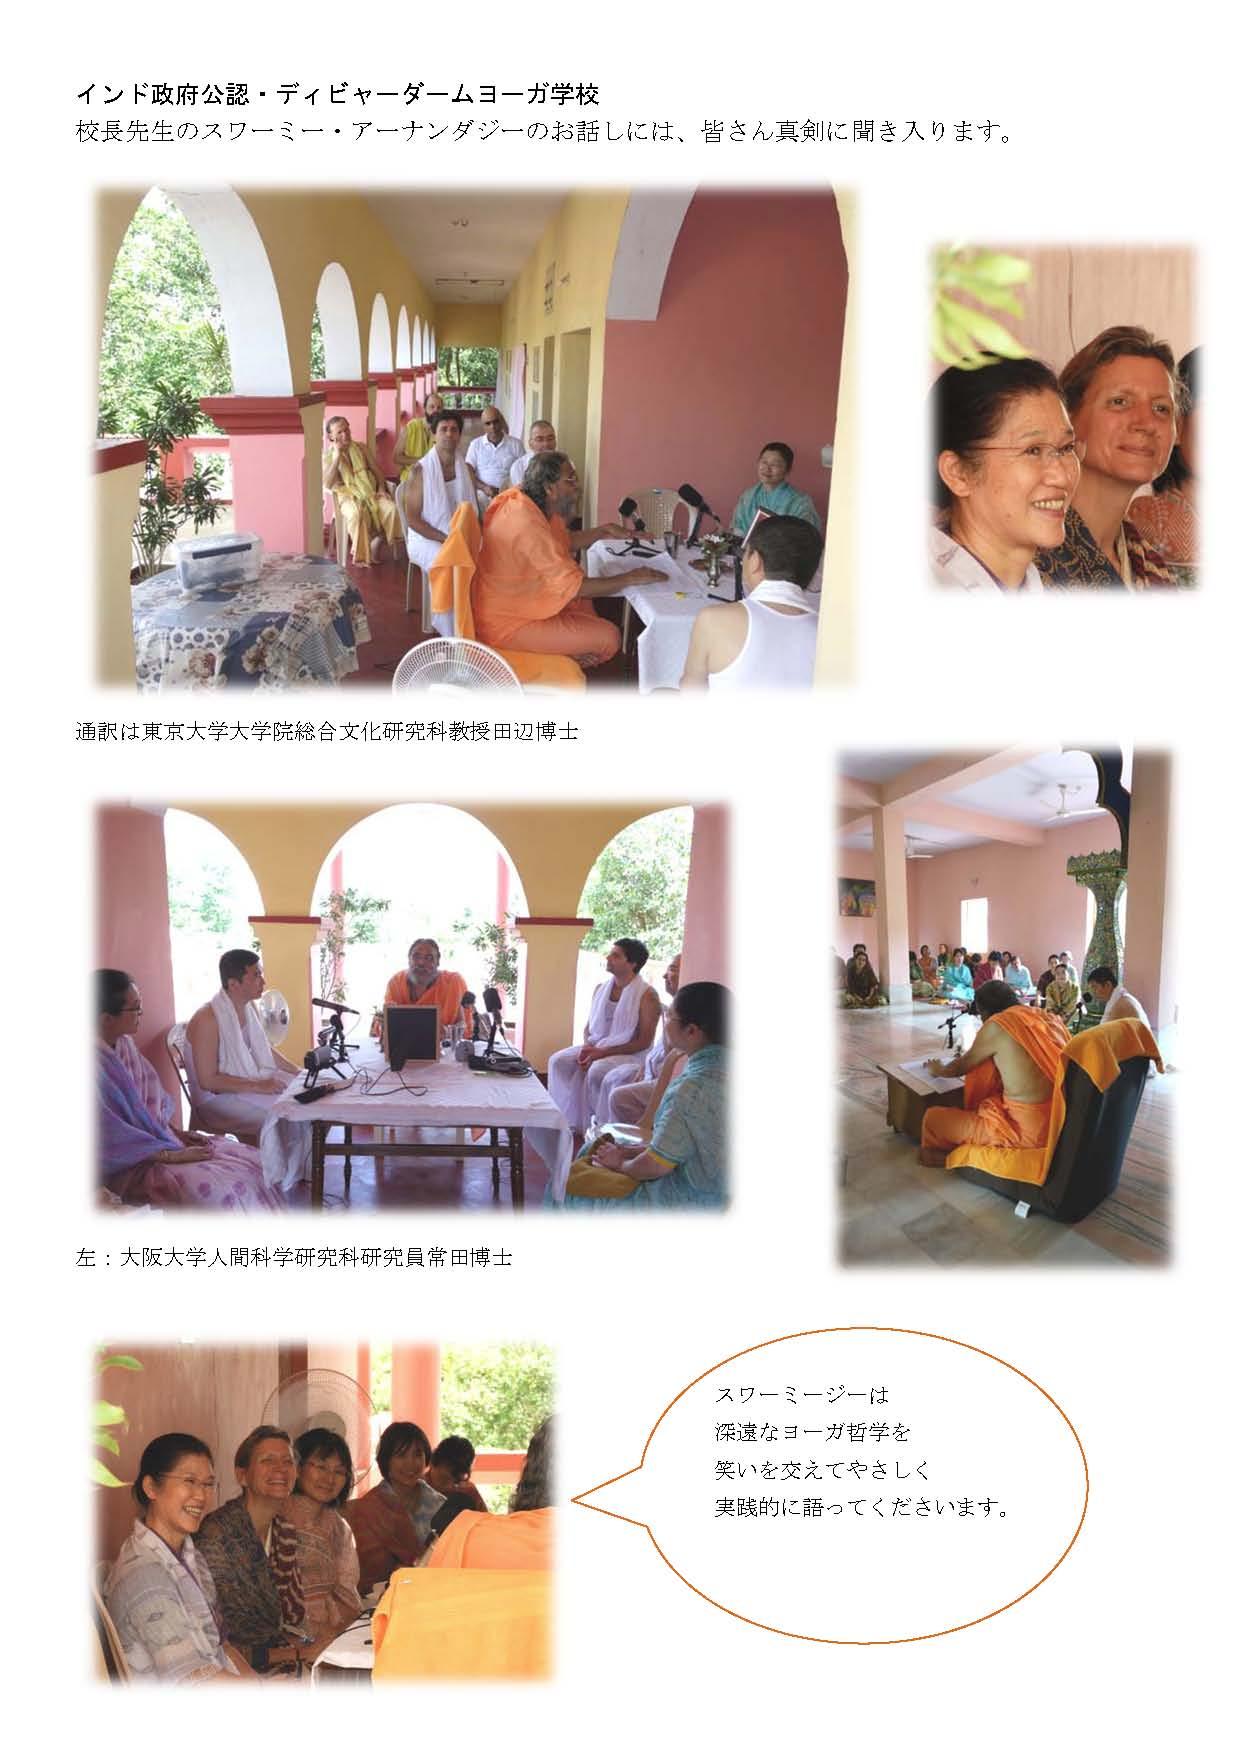 瞑想 呼吸法 ヨーガ哲学講義